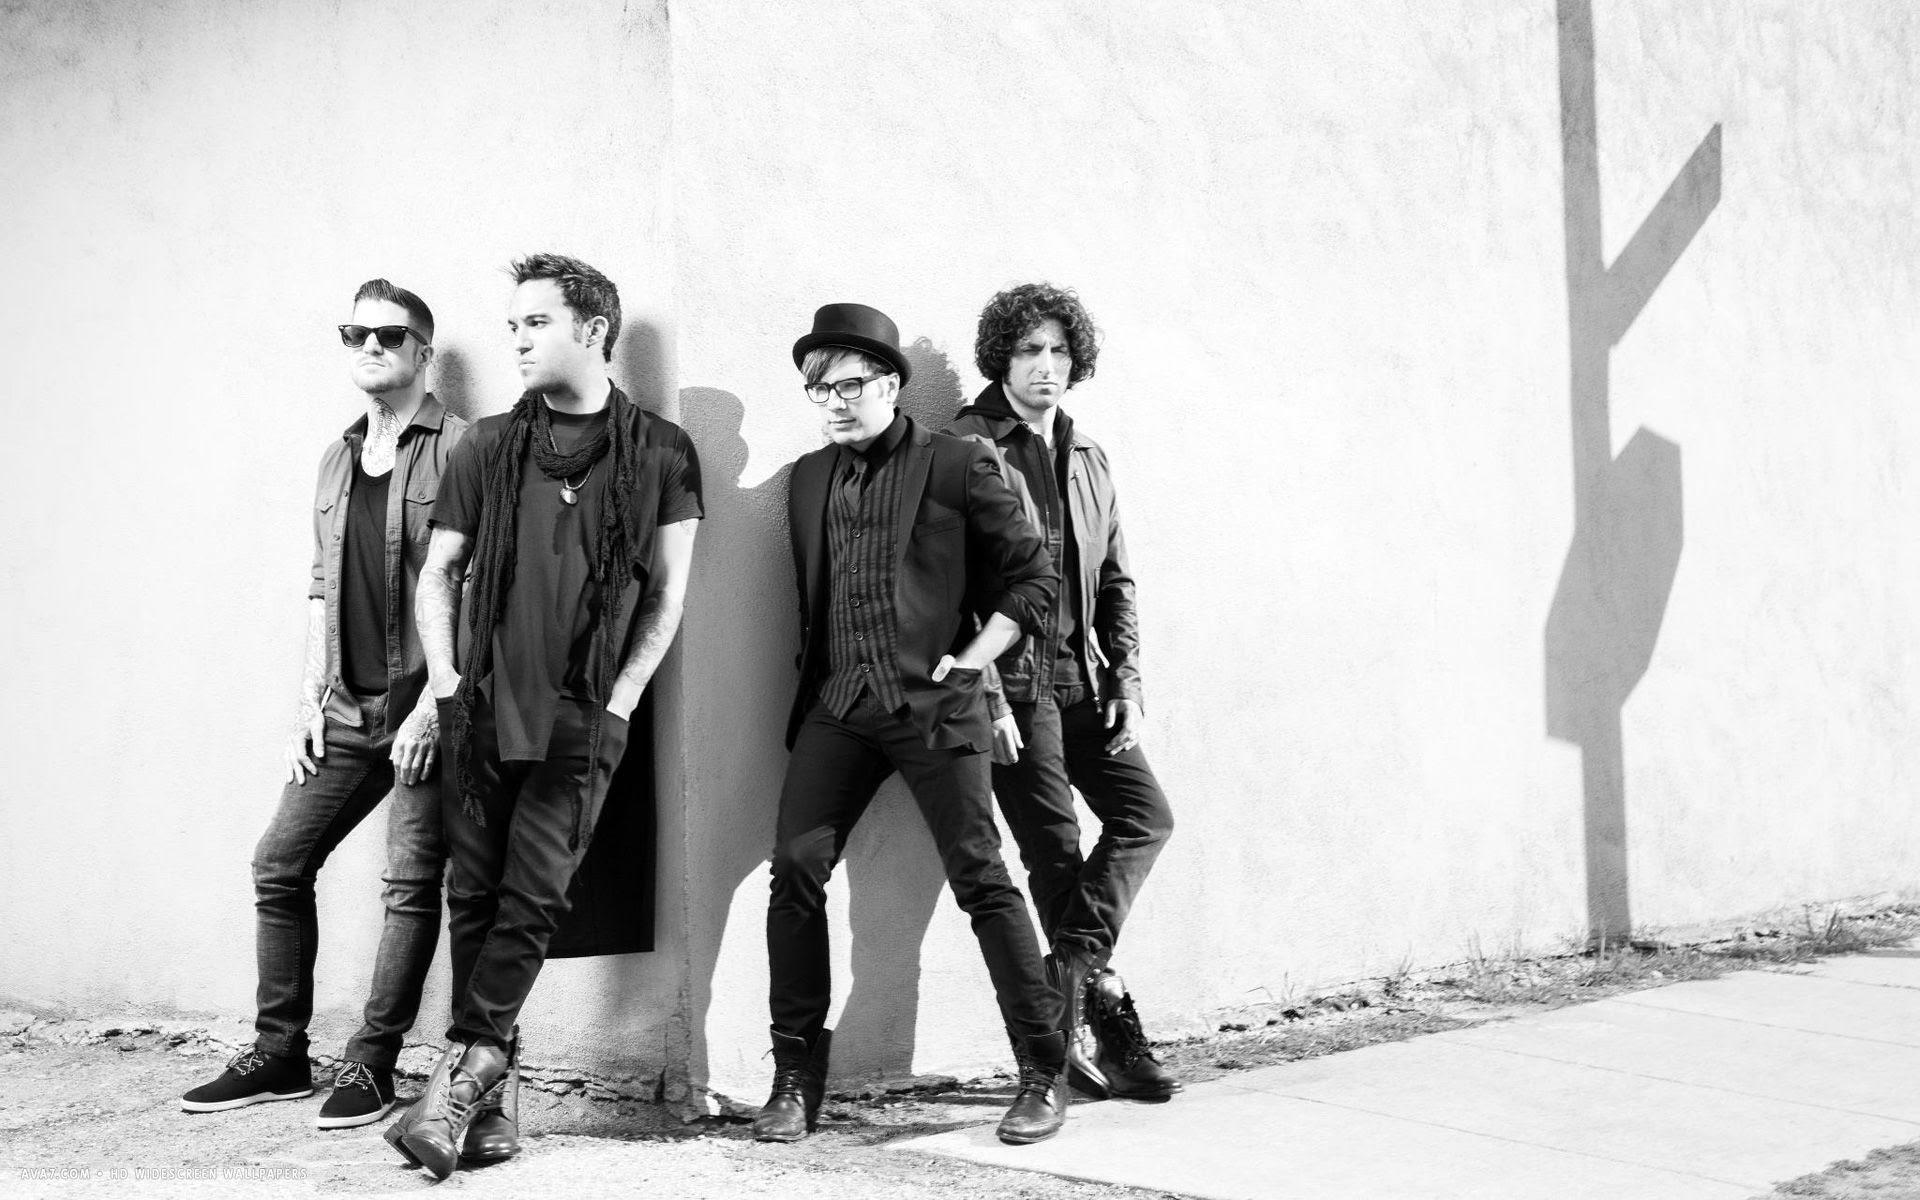 Fall Out Boy Music Band Group Hd Widescreen Wallpaper Music